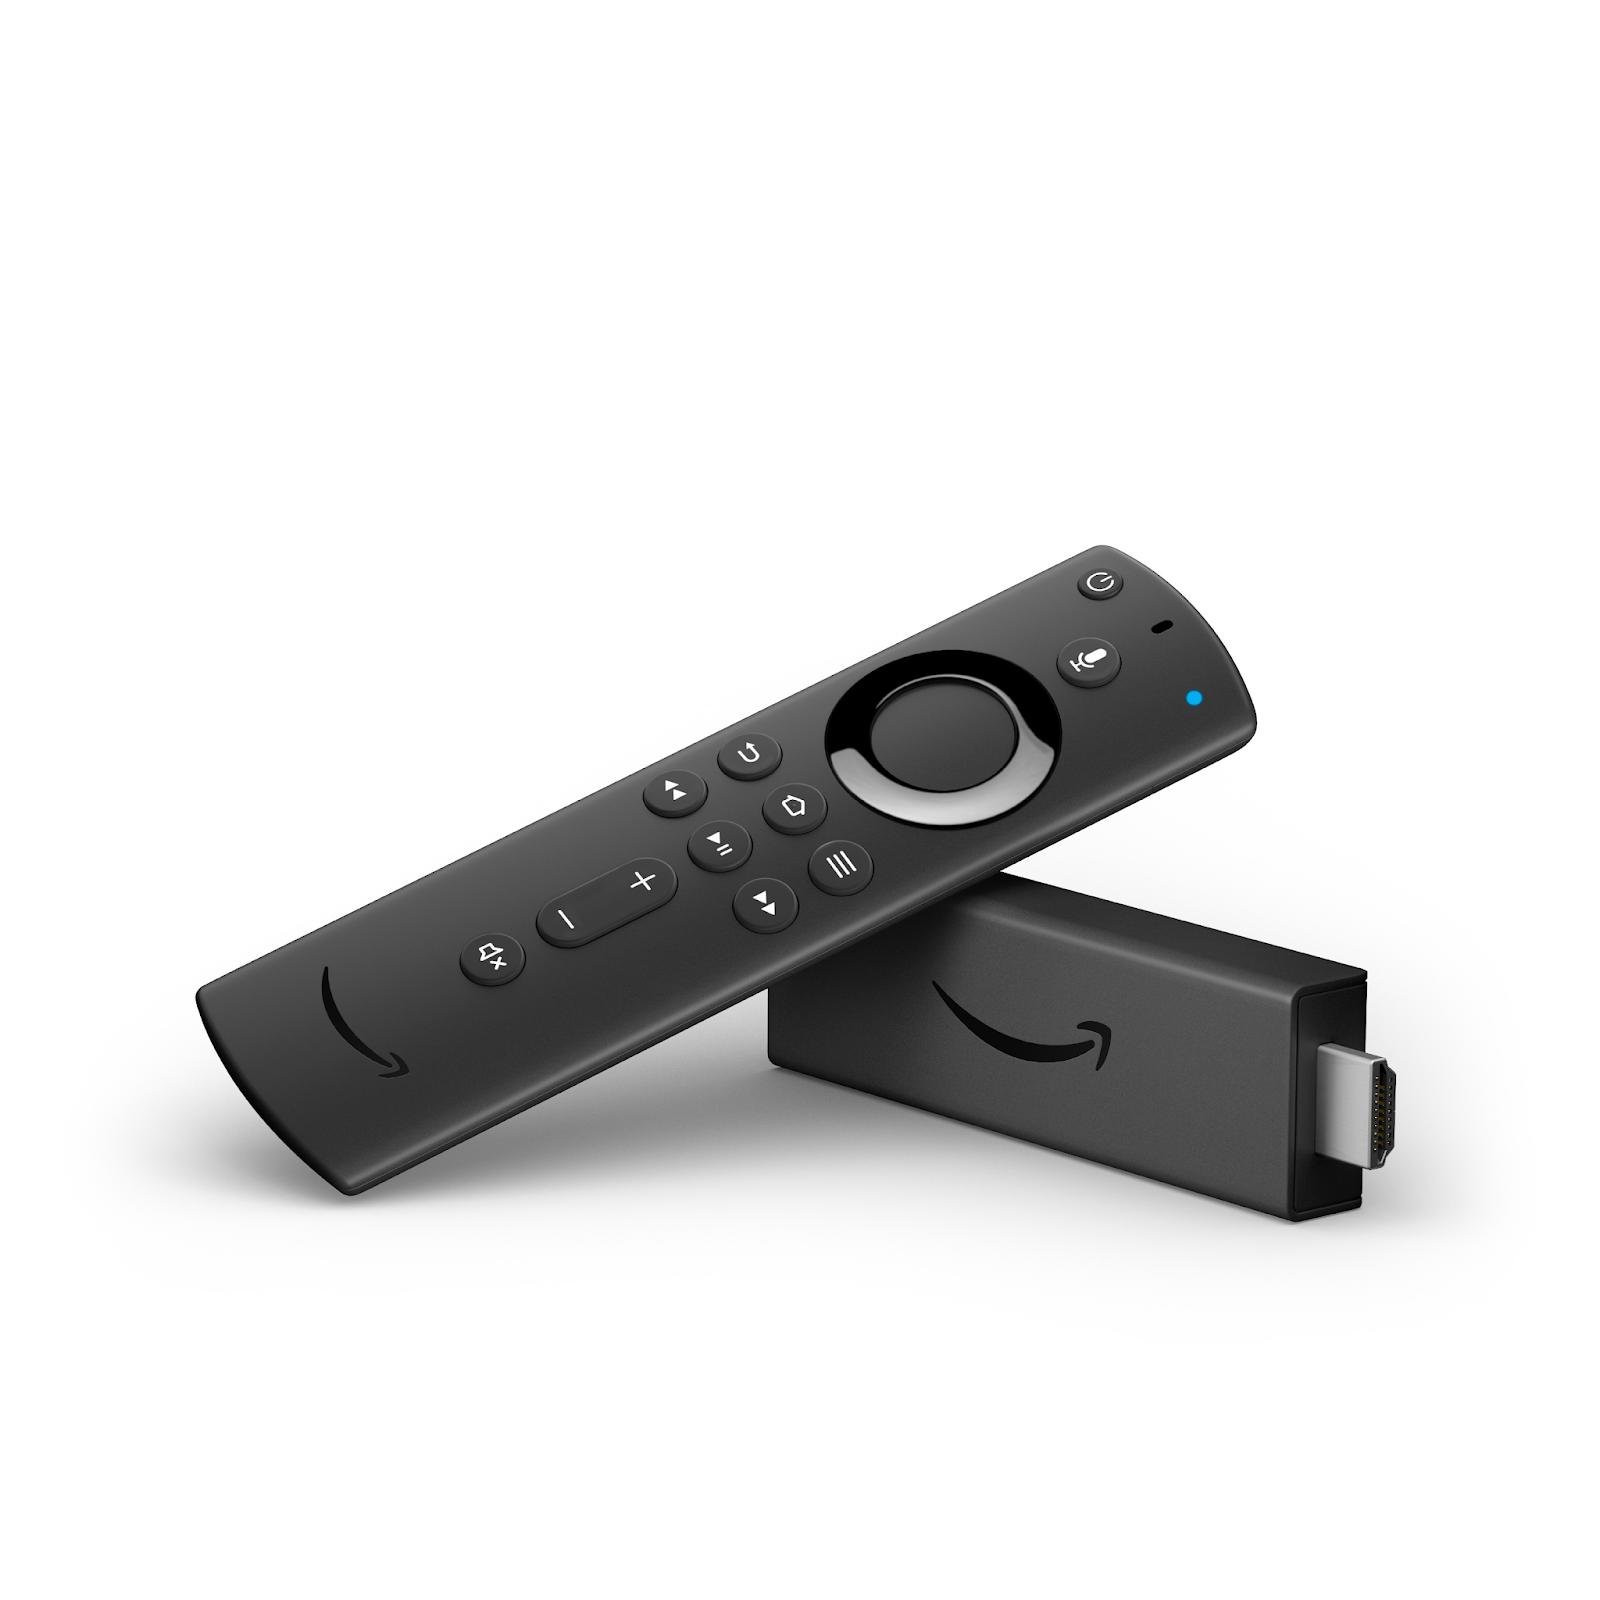 Amazon Fire TV Stick 4K with Alexa Remote